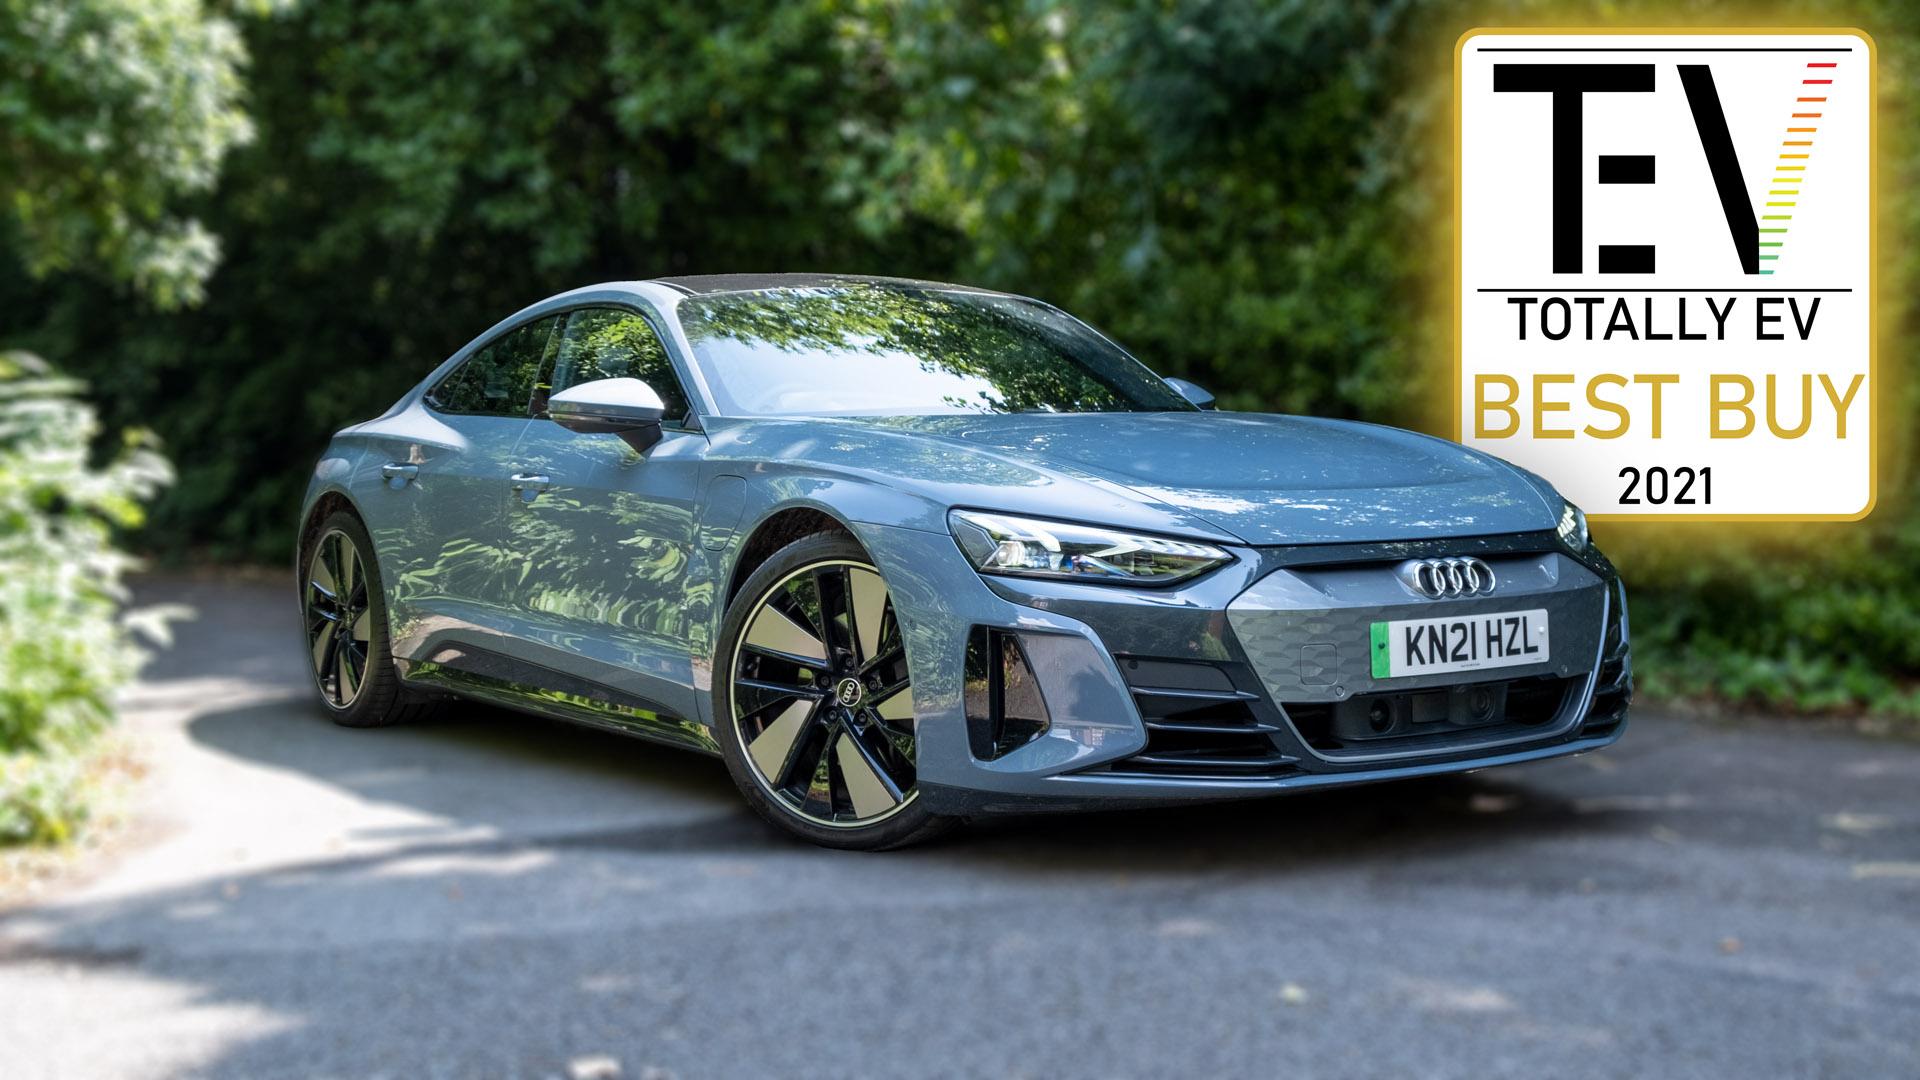 Audi e-tron GT TotallyEV award